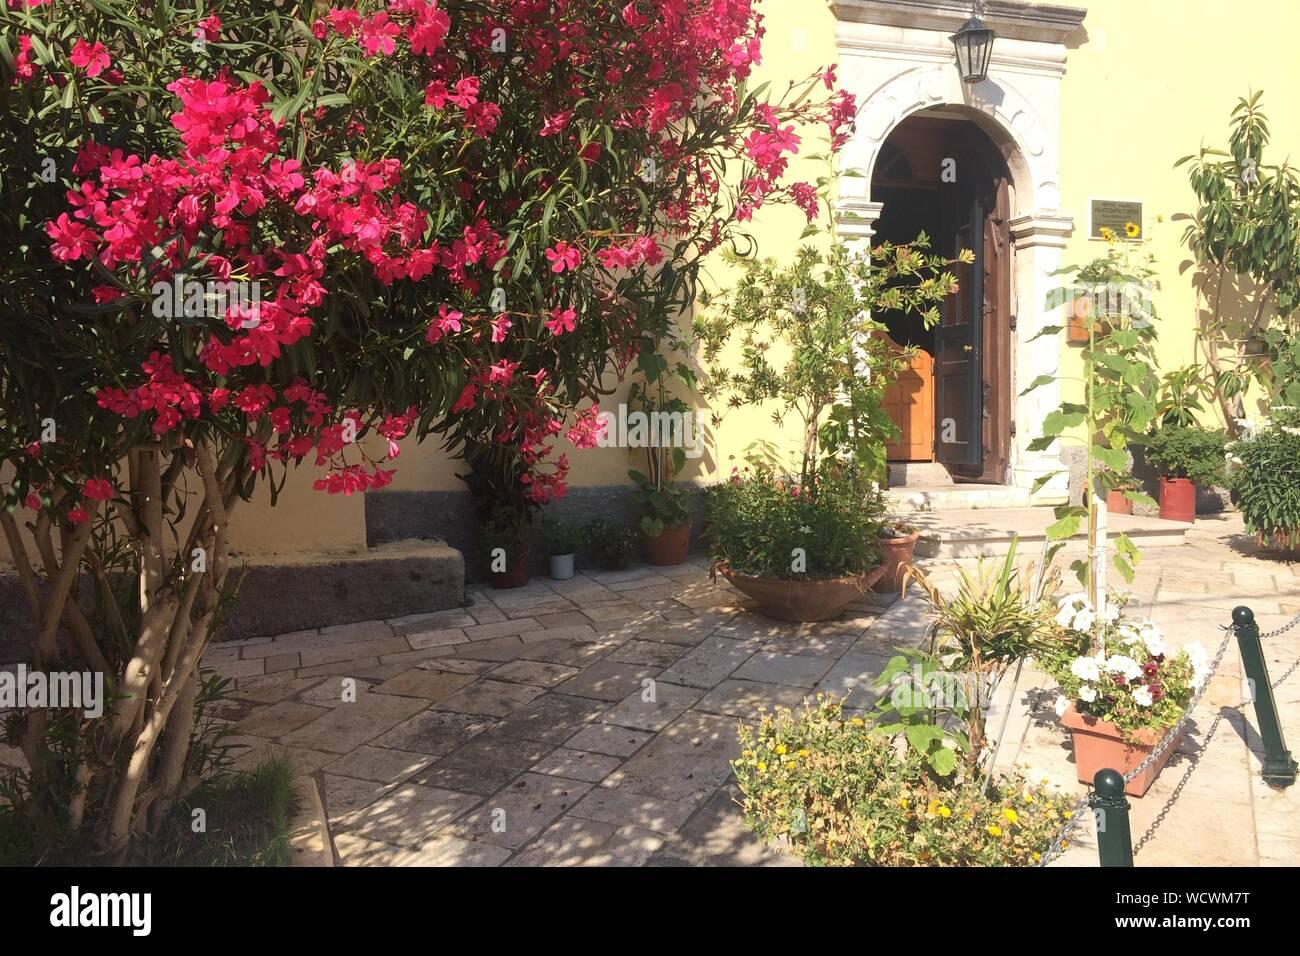 Jardin Fleuri D Une Maison Classique Photo Stock Alamy